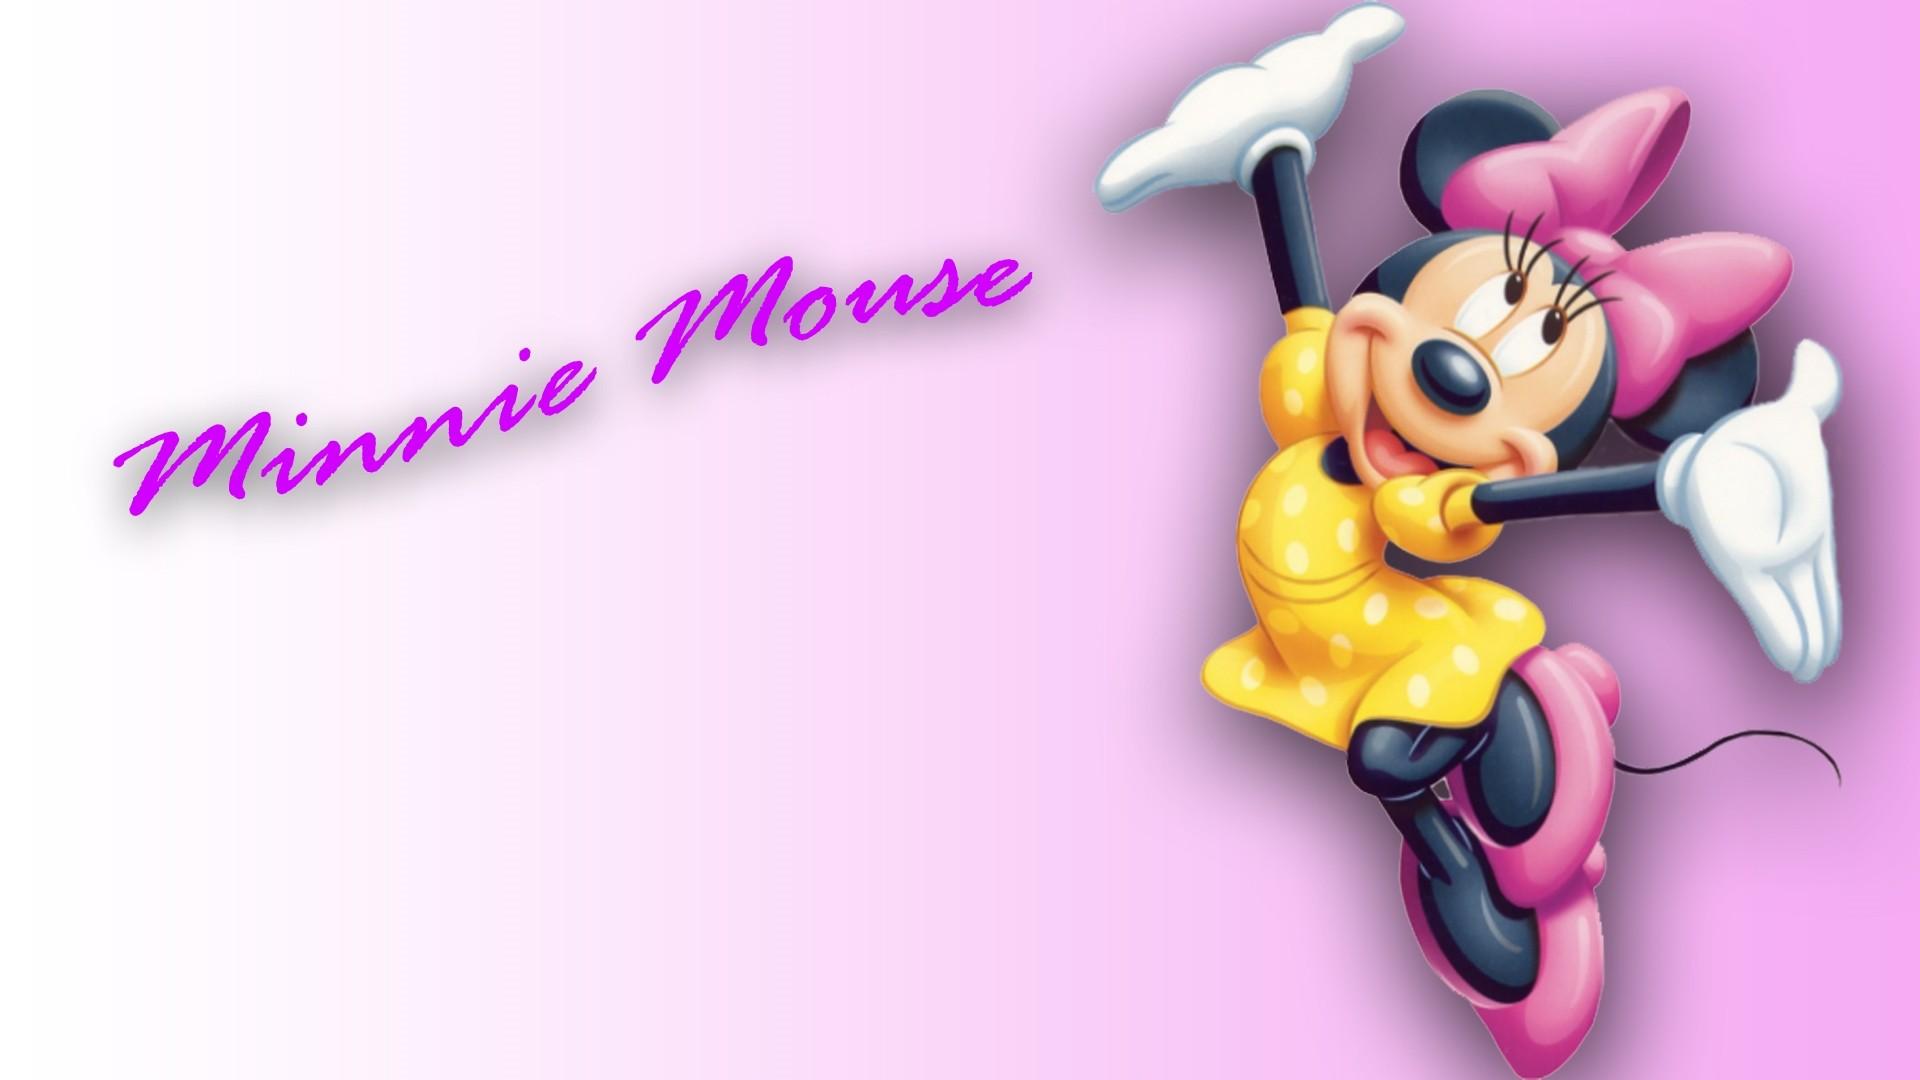 Minnie Mouse hd desktop wallpaper